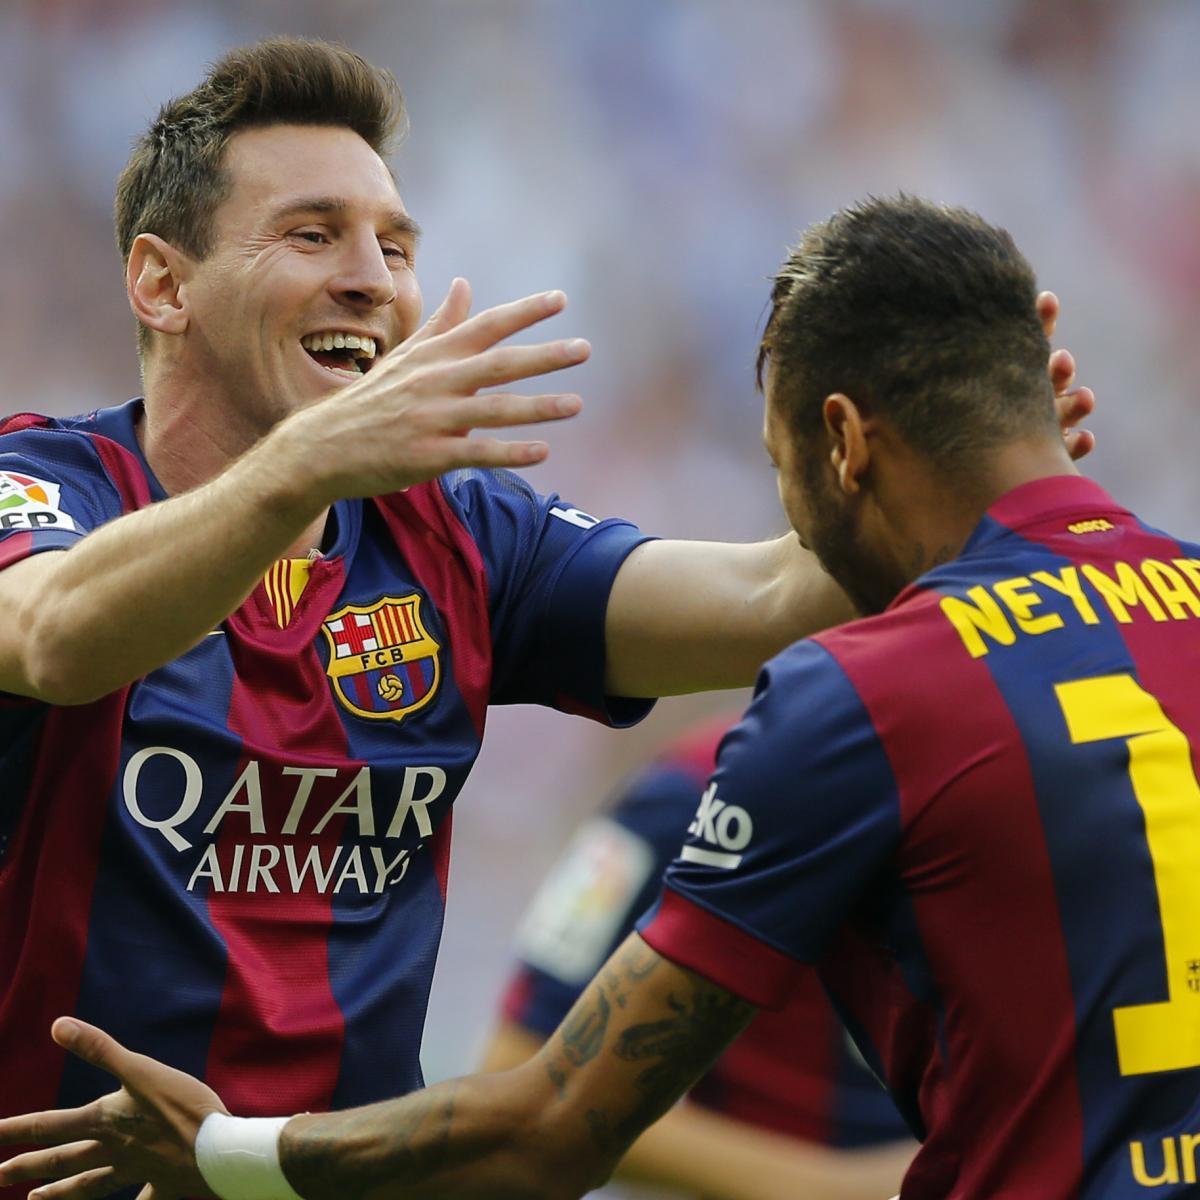 Barcelona Vs. Celta Vigo: Date, Time, Live Stream, TV Info